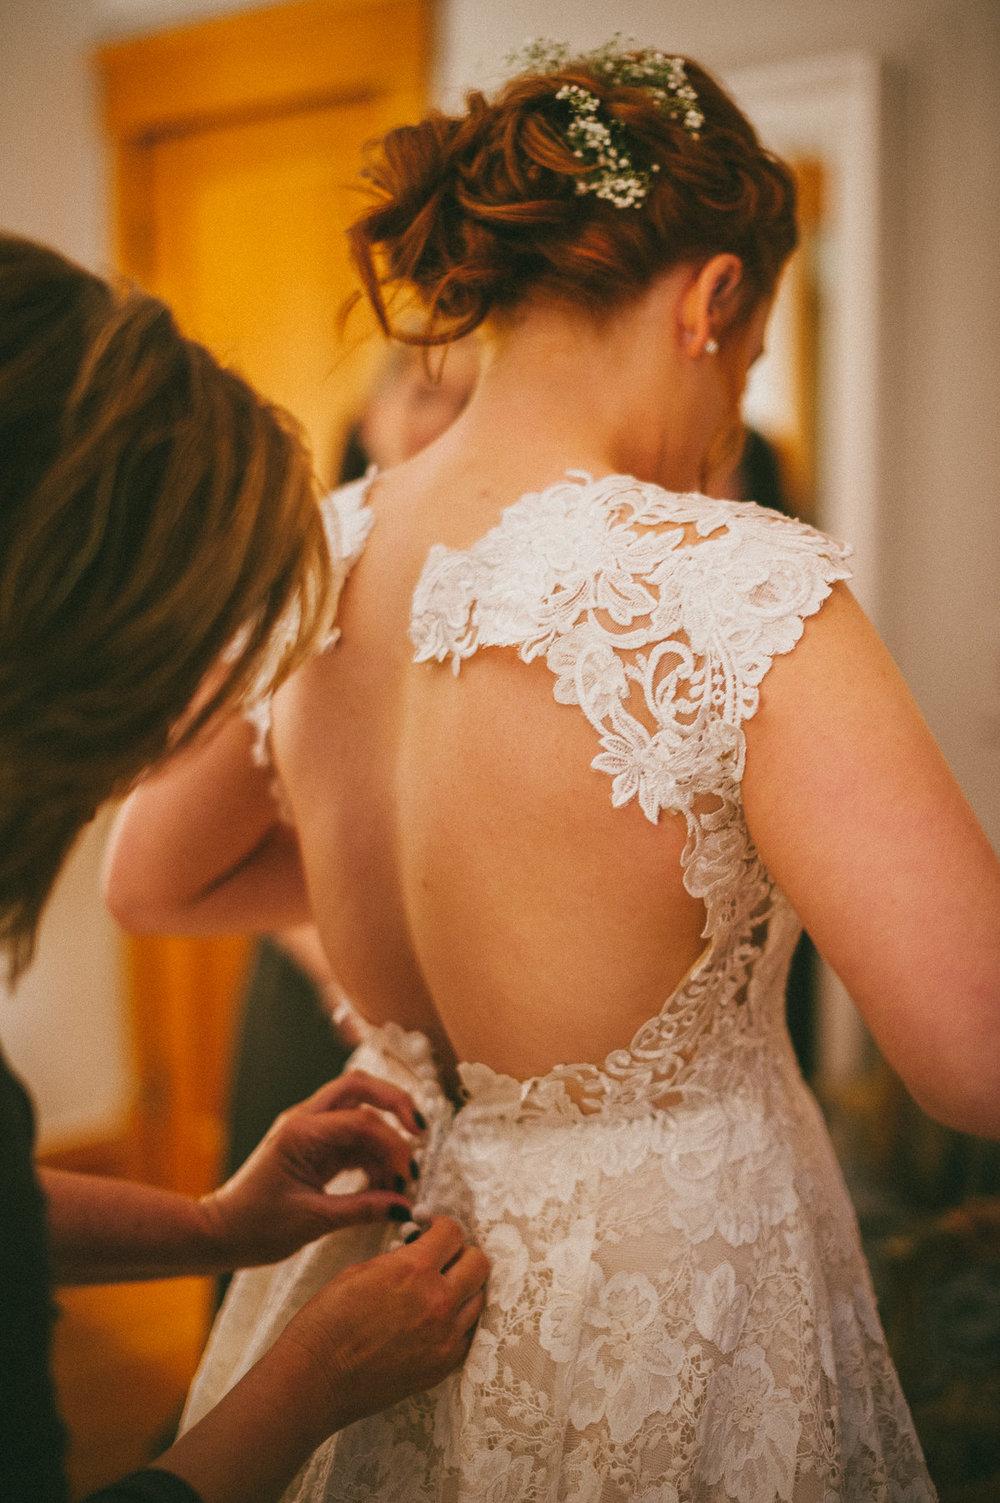 breighton-and-basette-photography-copyrighted-image-blog-amanda-and-eric-wedding-052.jpg